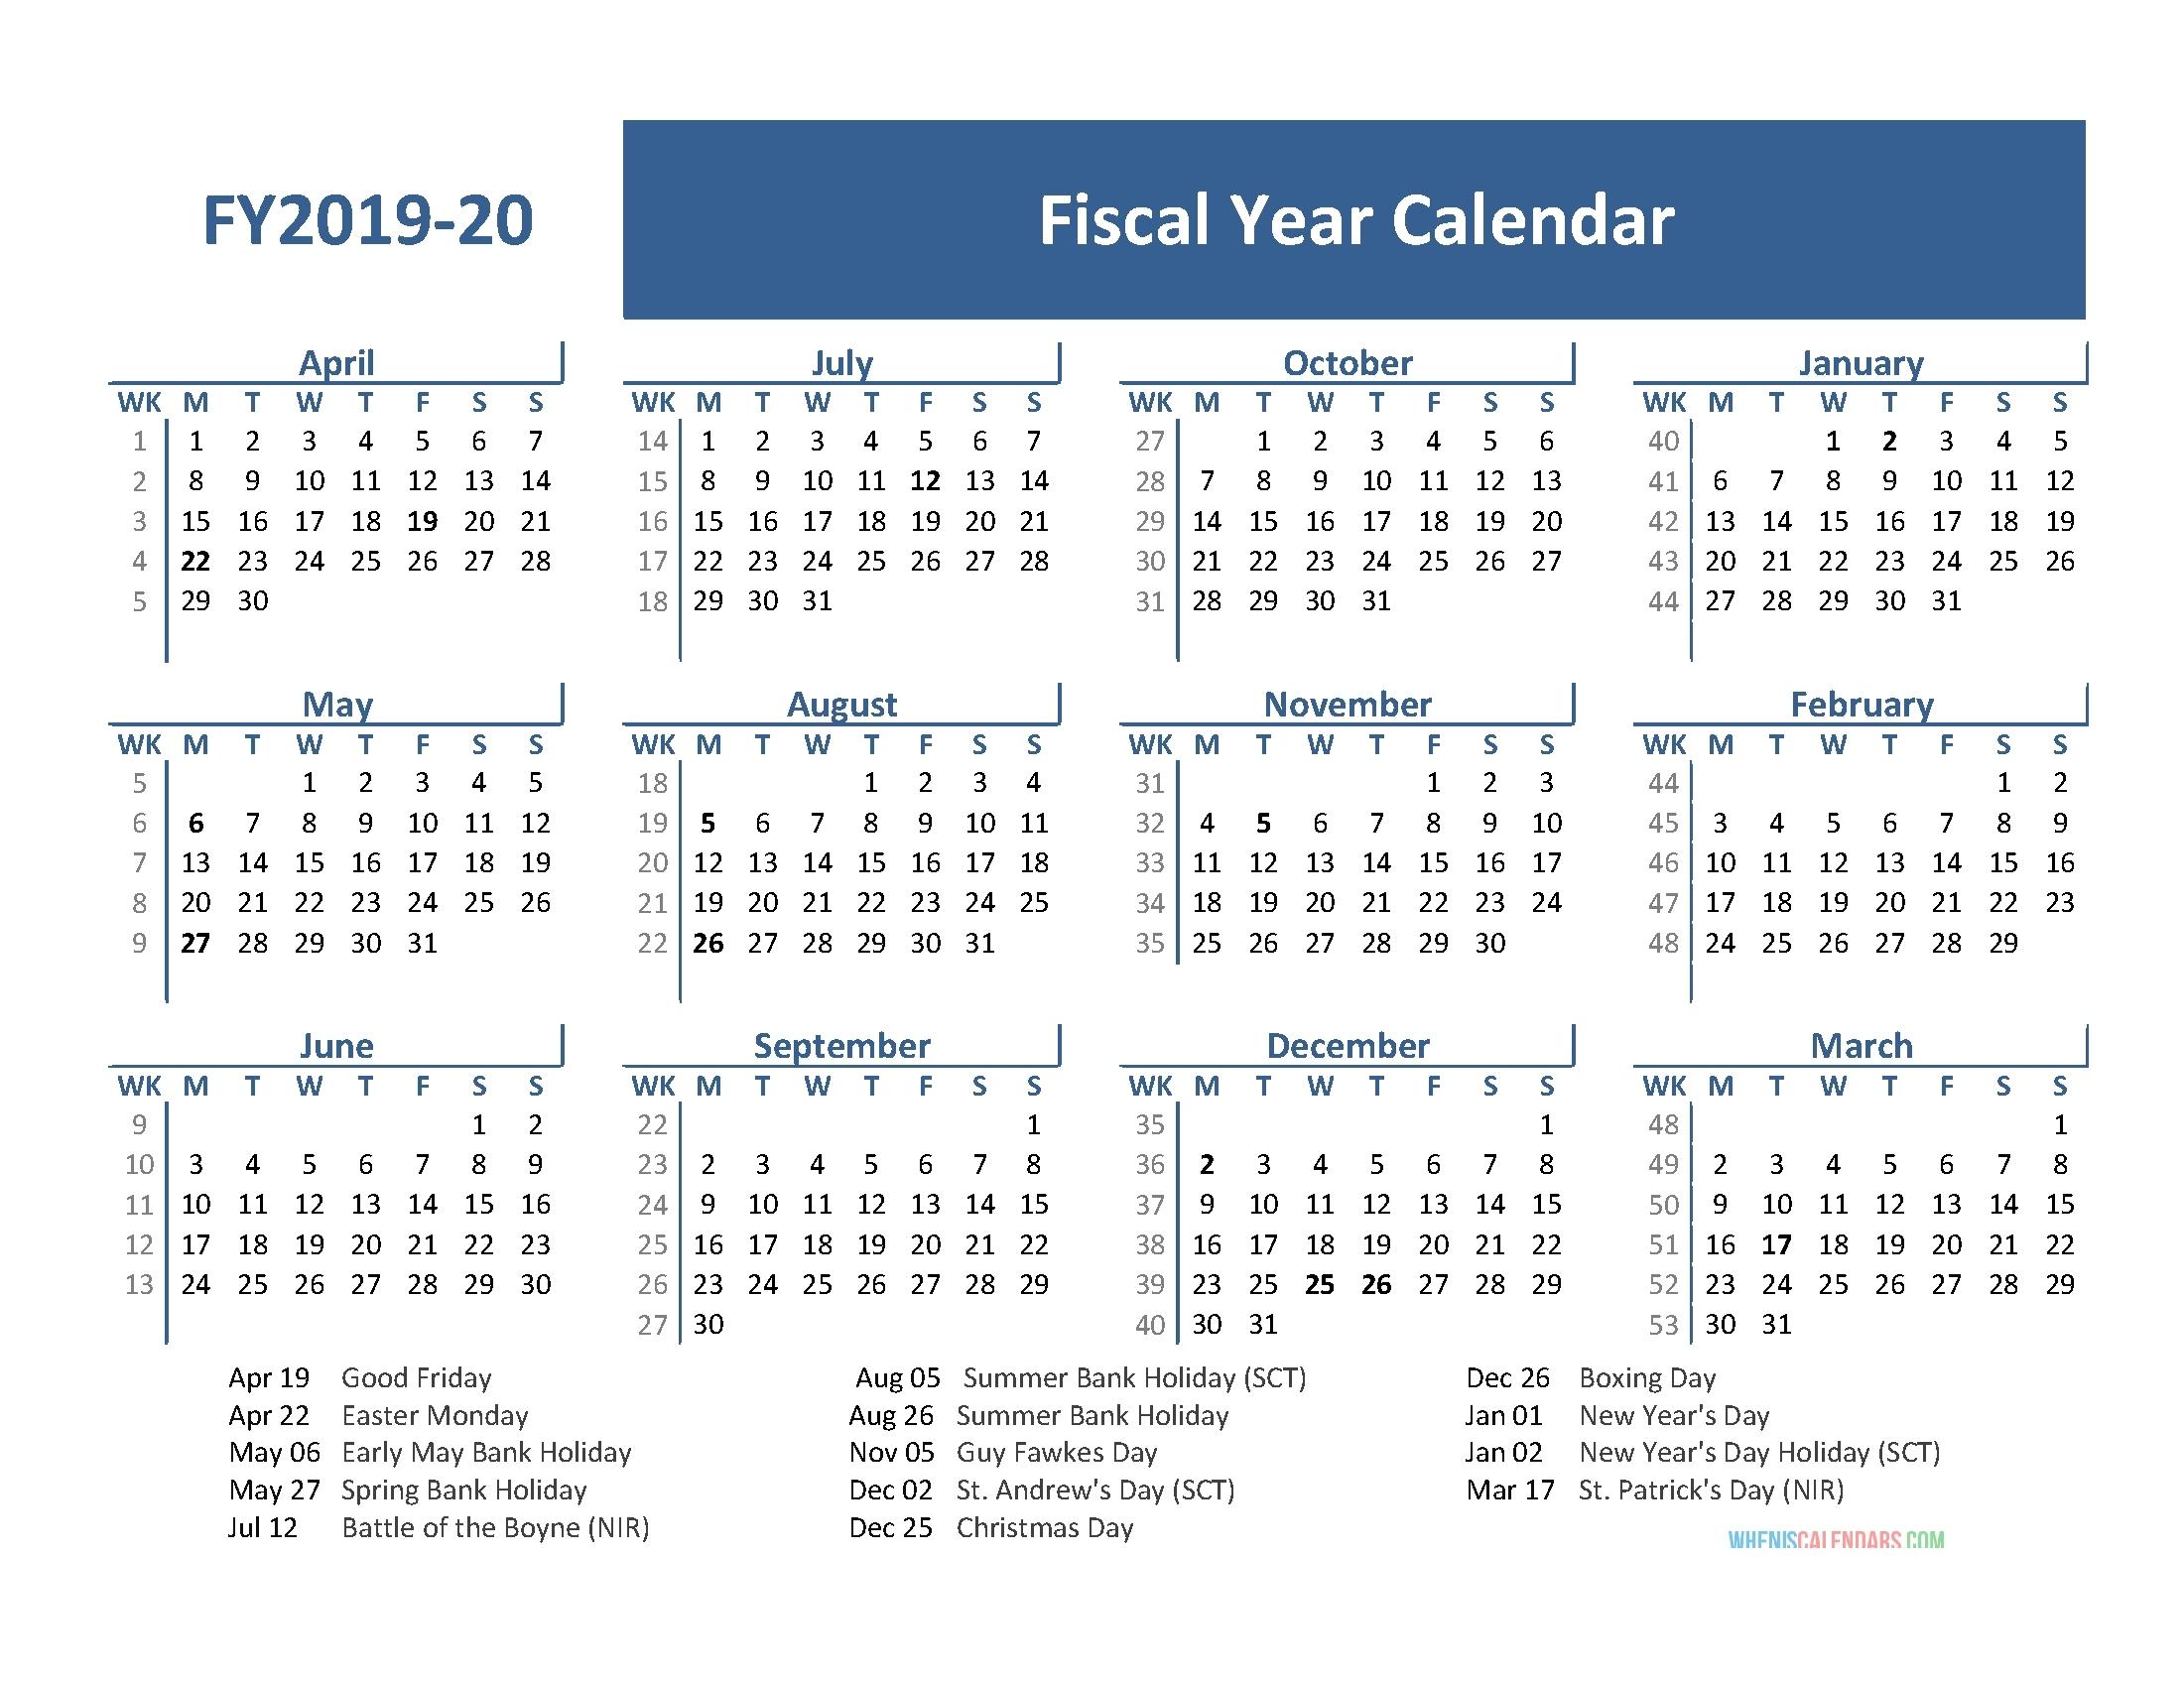 2019-2020 Calendar Financial Week Numbers - Calendar inside Financial Year Calendar 2019/20 Week Numbers